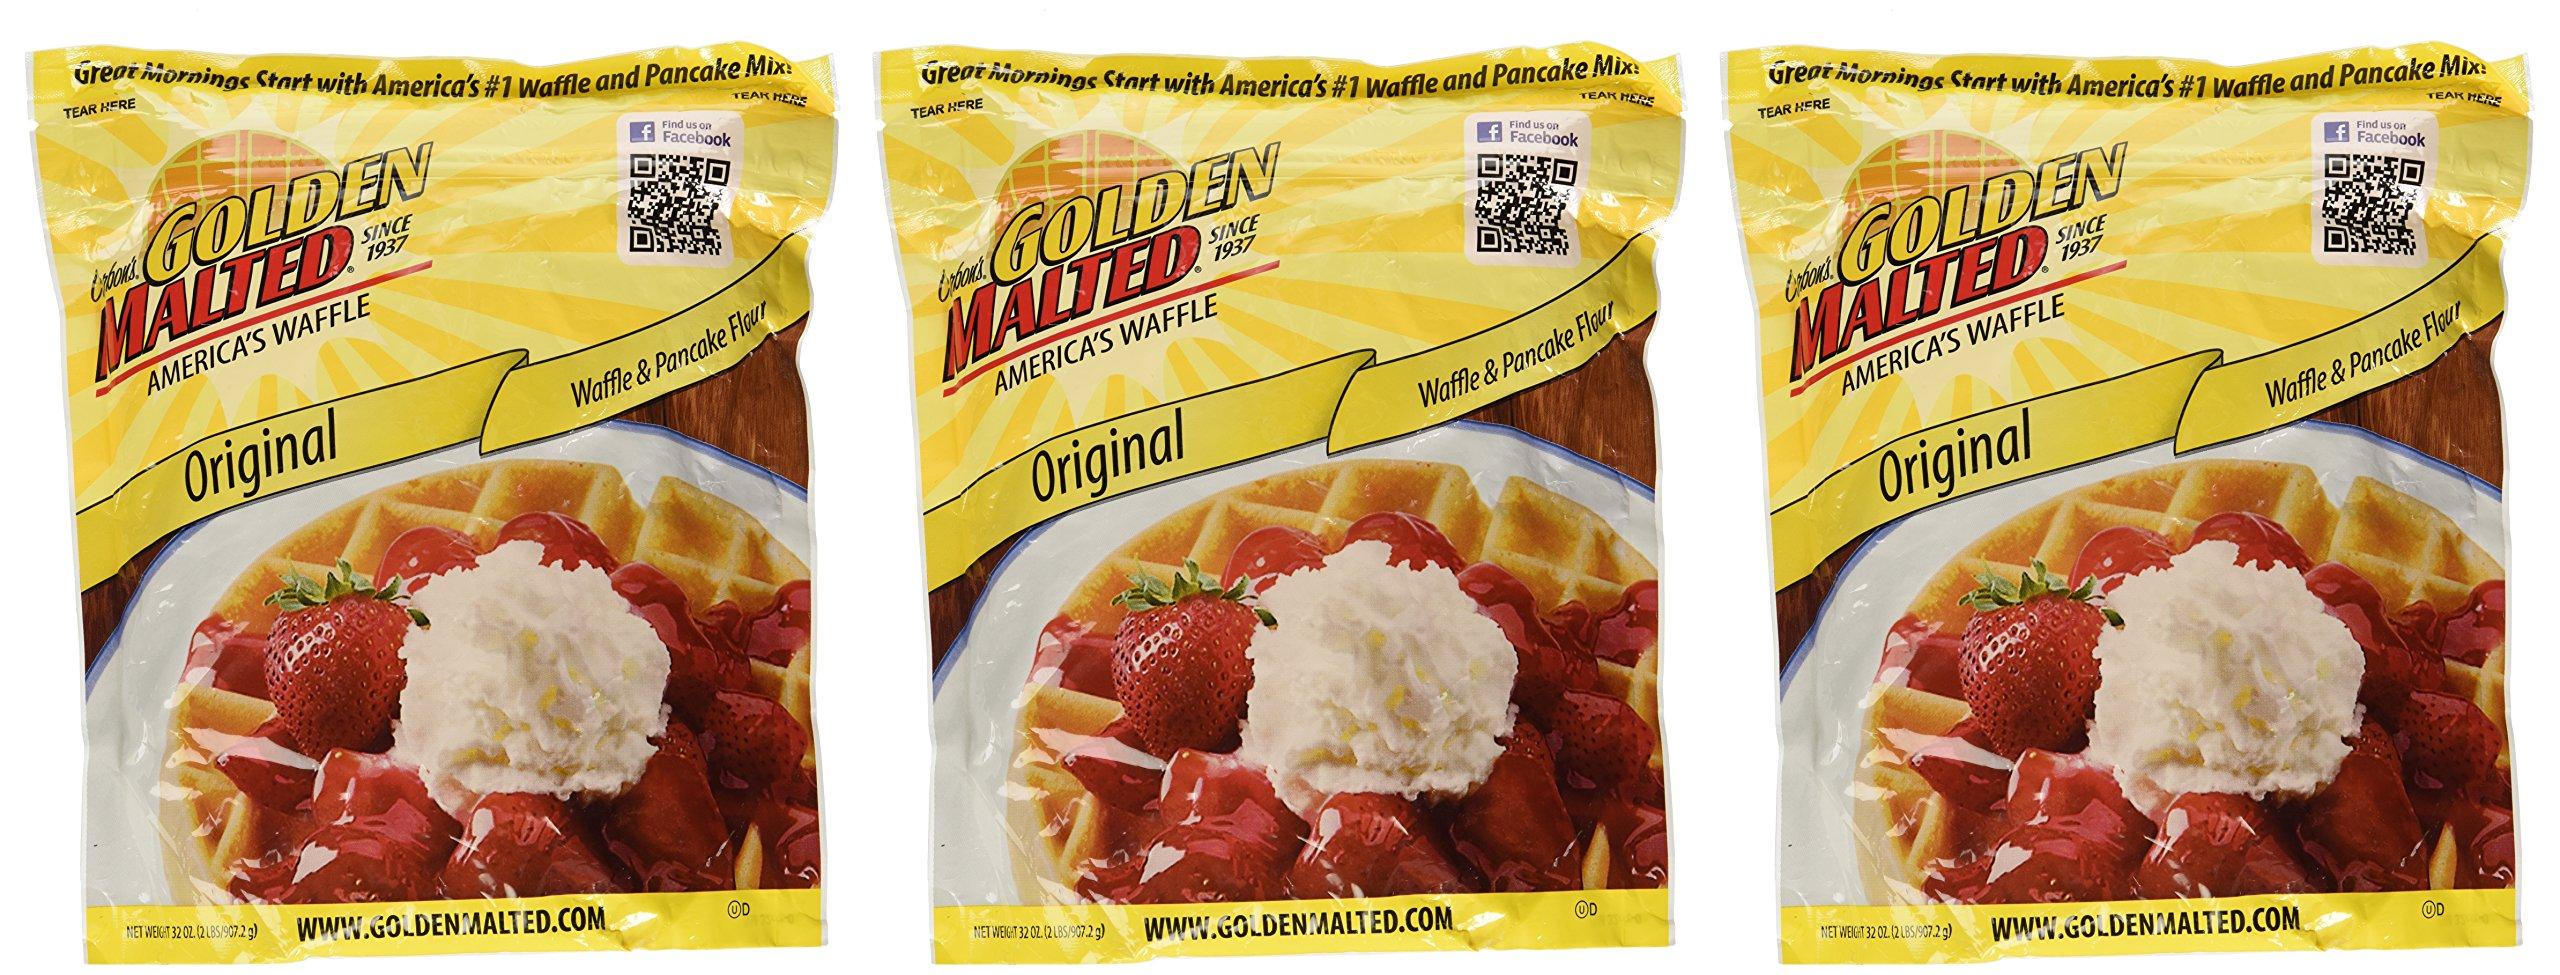 Carbon's Golden Malted Pancake & Waffle Flour Mix, Original, 32-Ounces (Pack of 3)